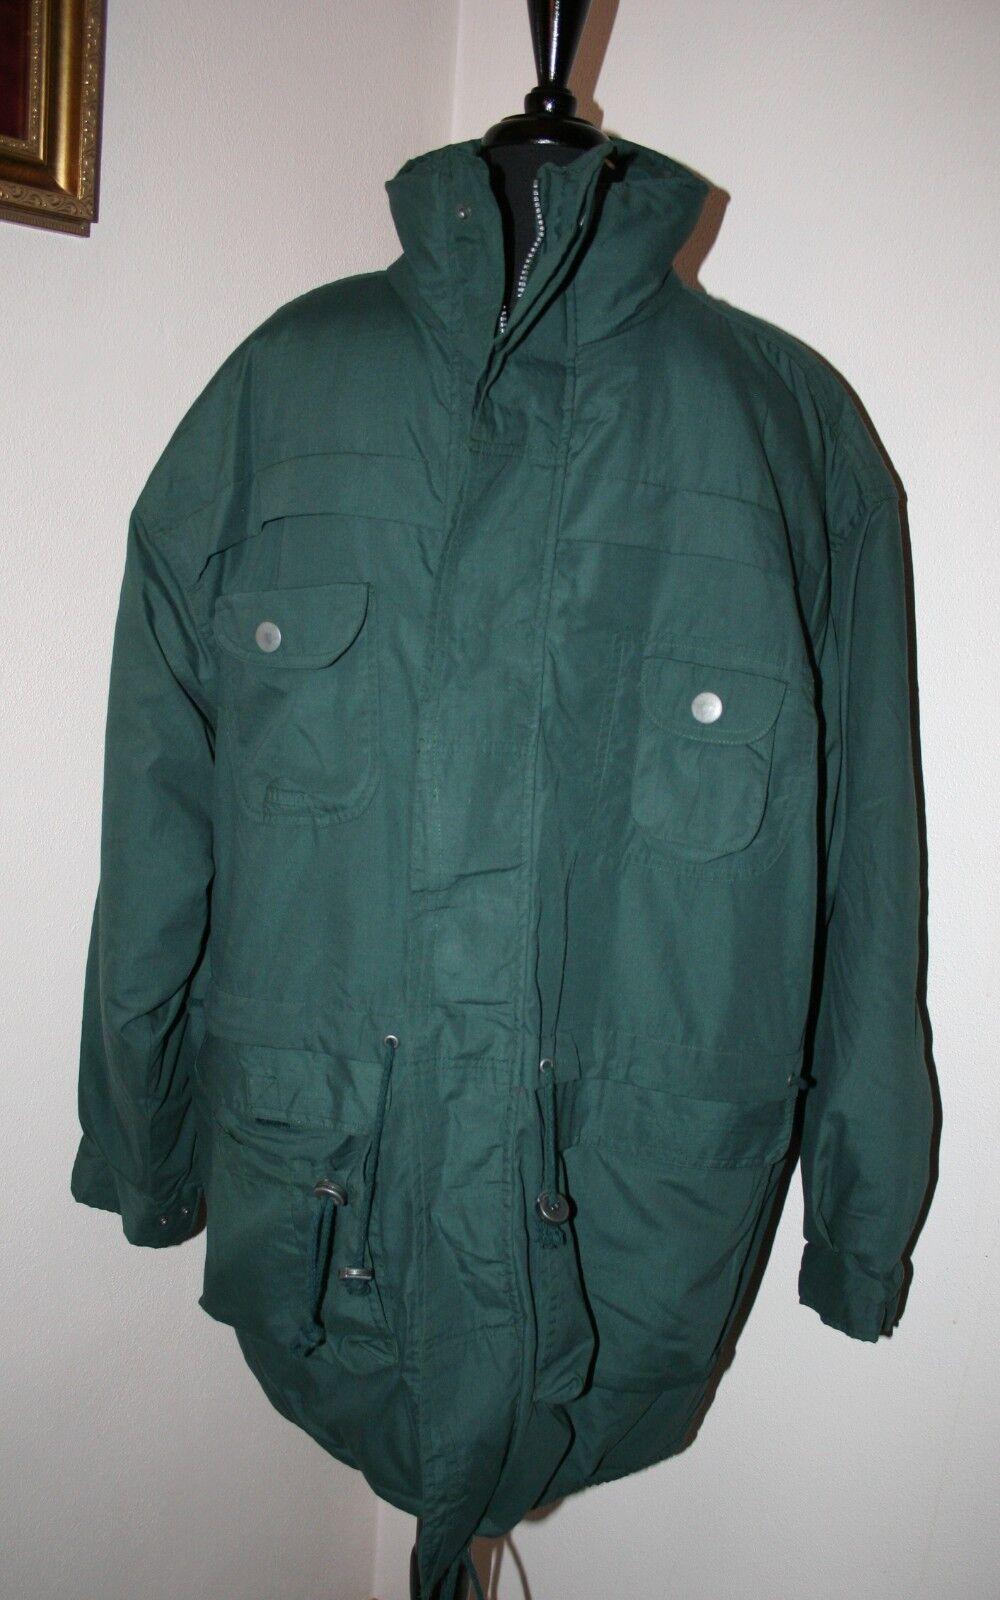 Men's Duffel Coat Parka LARGE Green Threads Unlim… - image 1